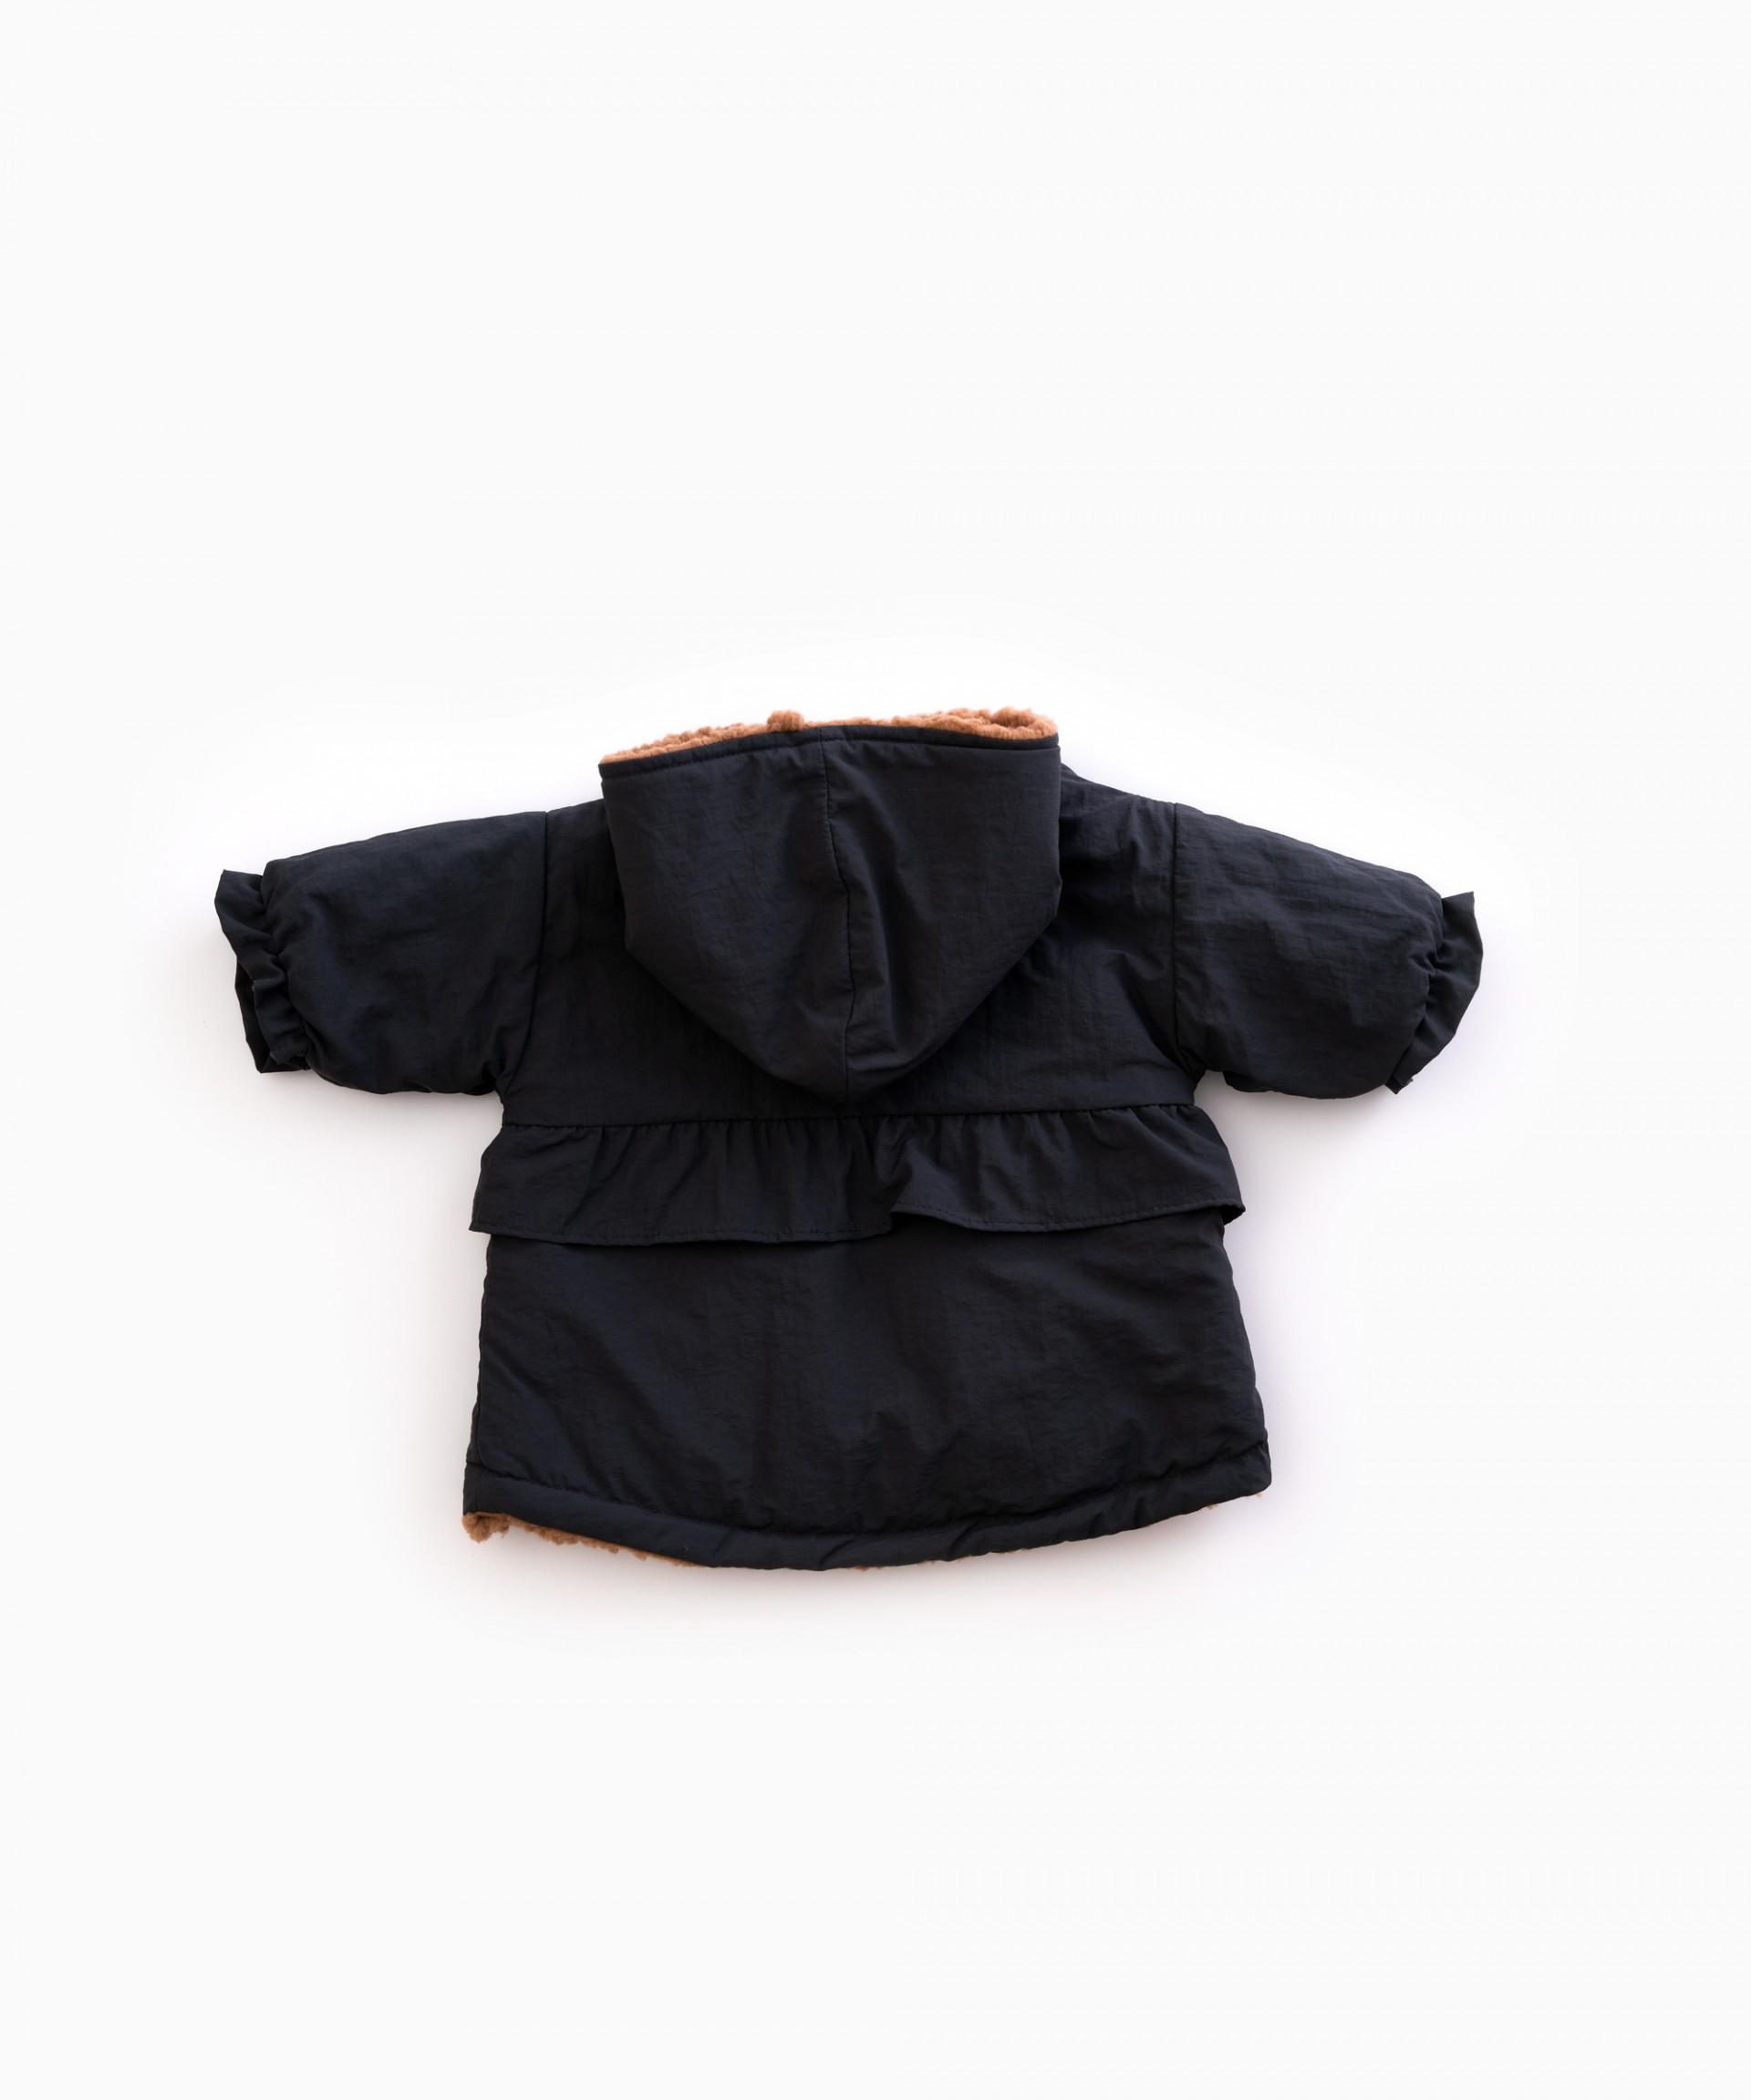 Hooded waterproof parka